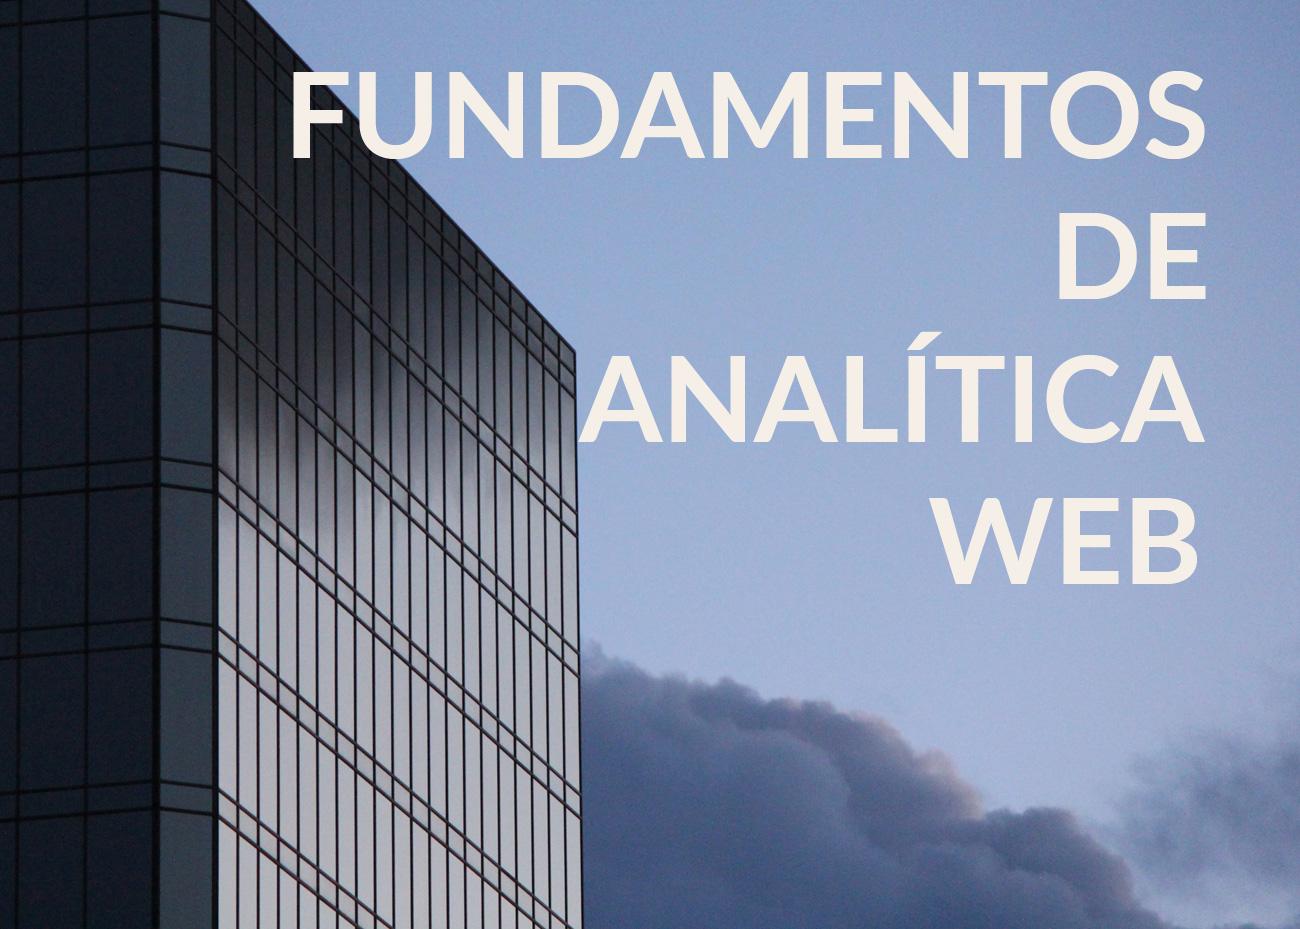 principios fundamentos analitica web